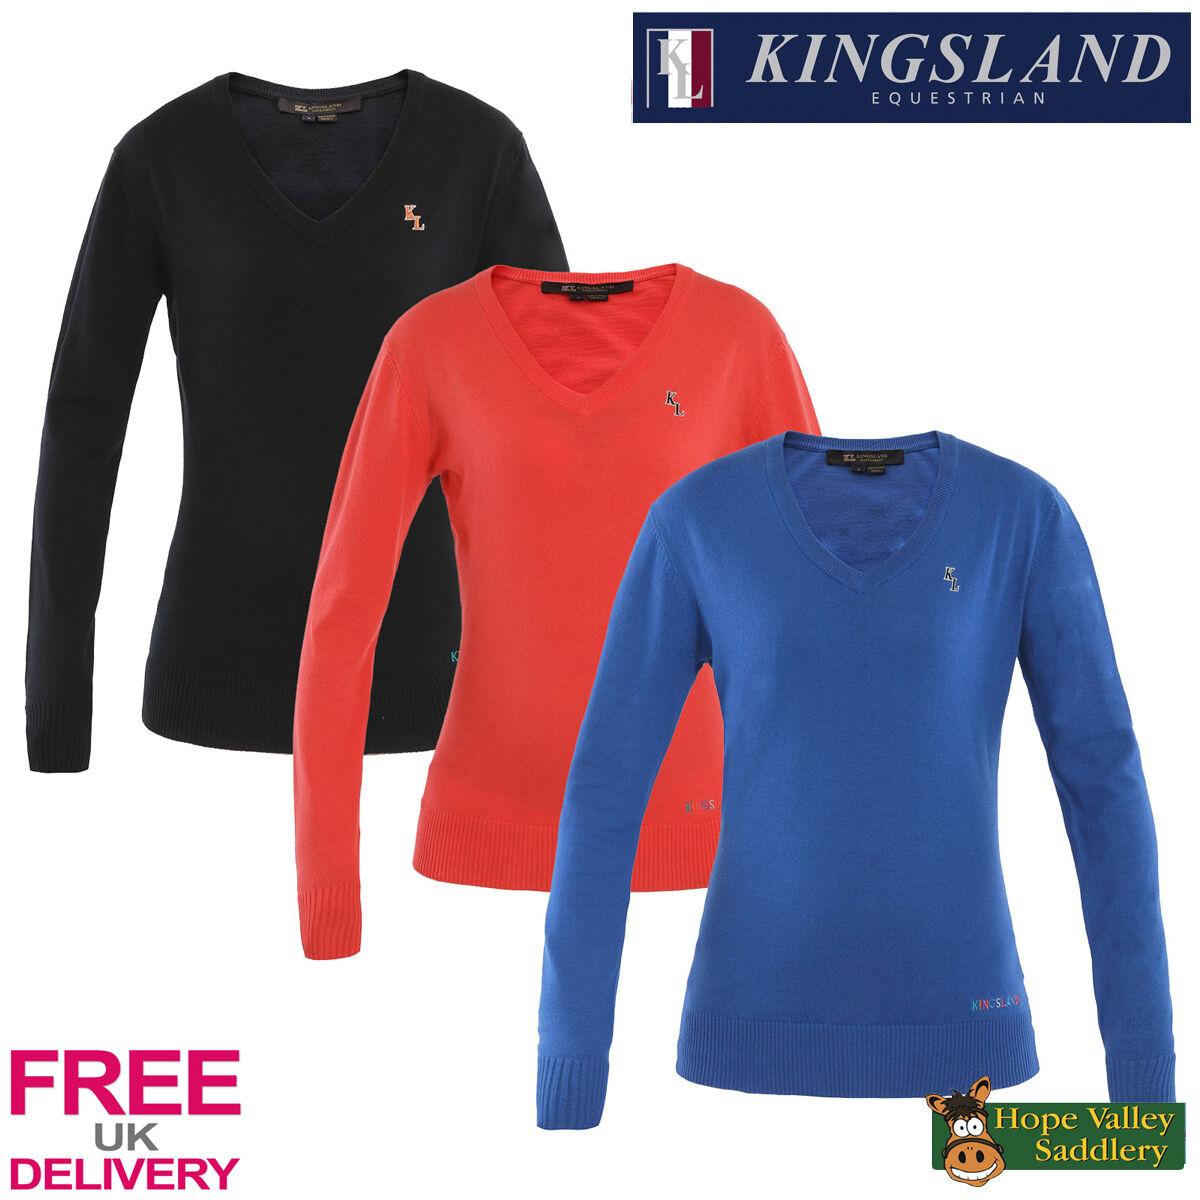 Kingsland Lana Knitted Sweatshirt (141-KN-372) - Sale FREE UK Shipping